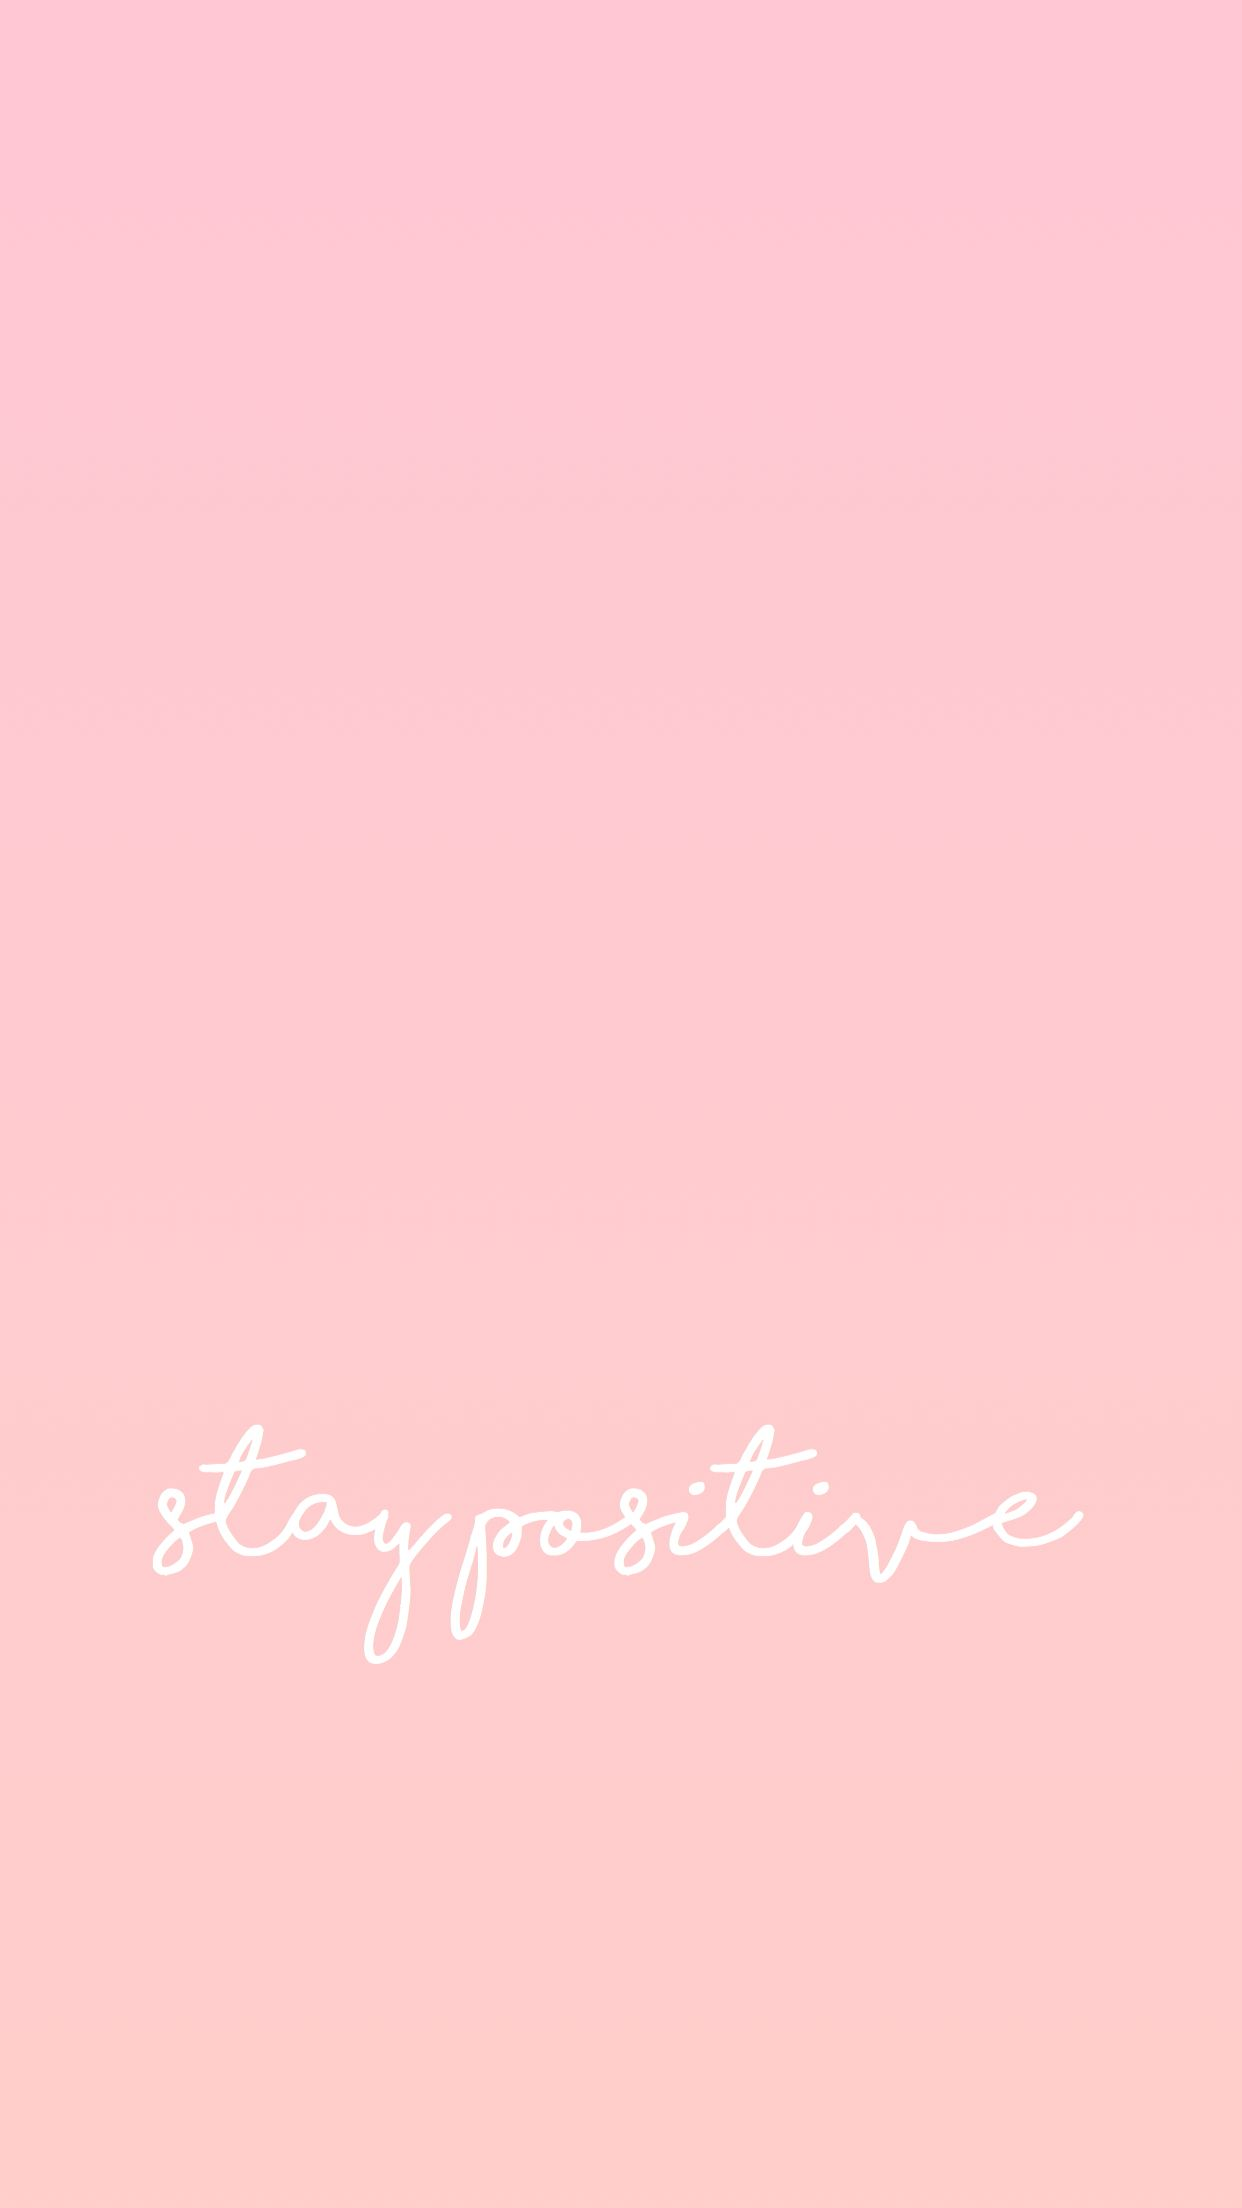 iPhone wallpaper stay positive // iphonewallpaper